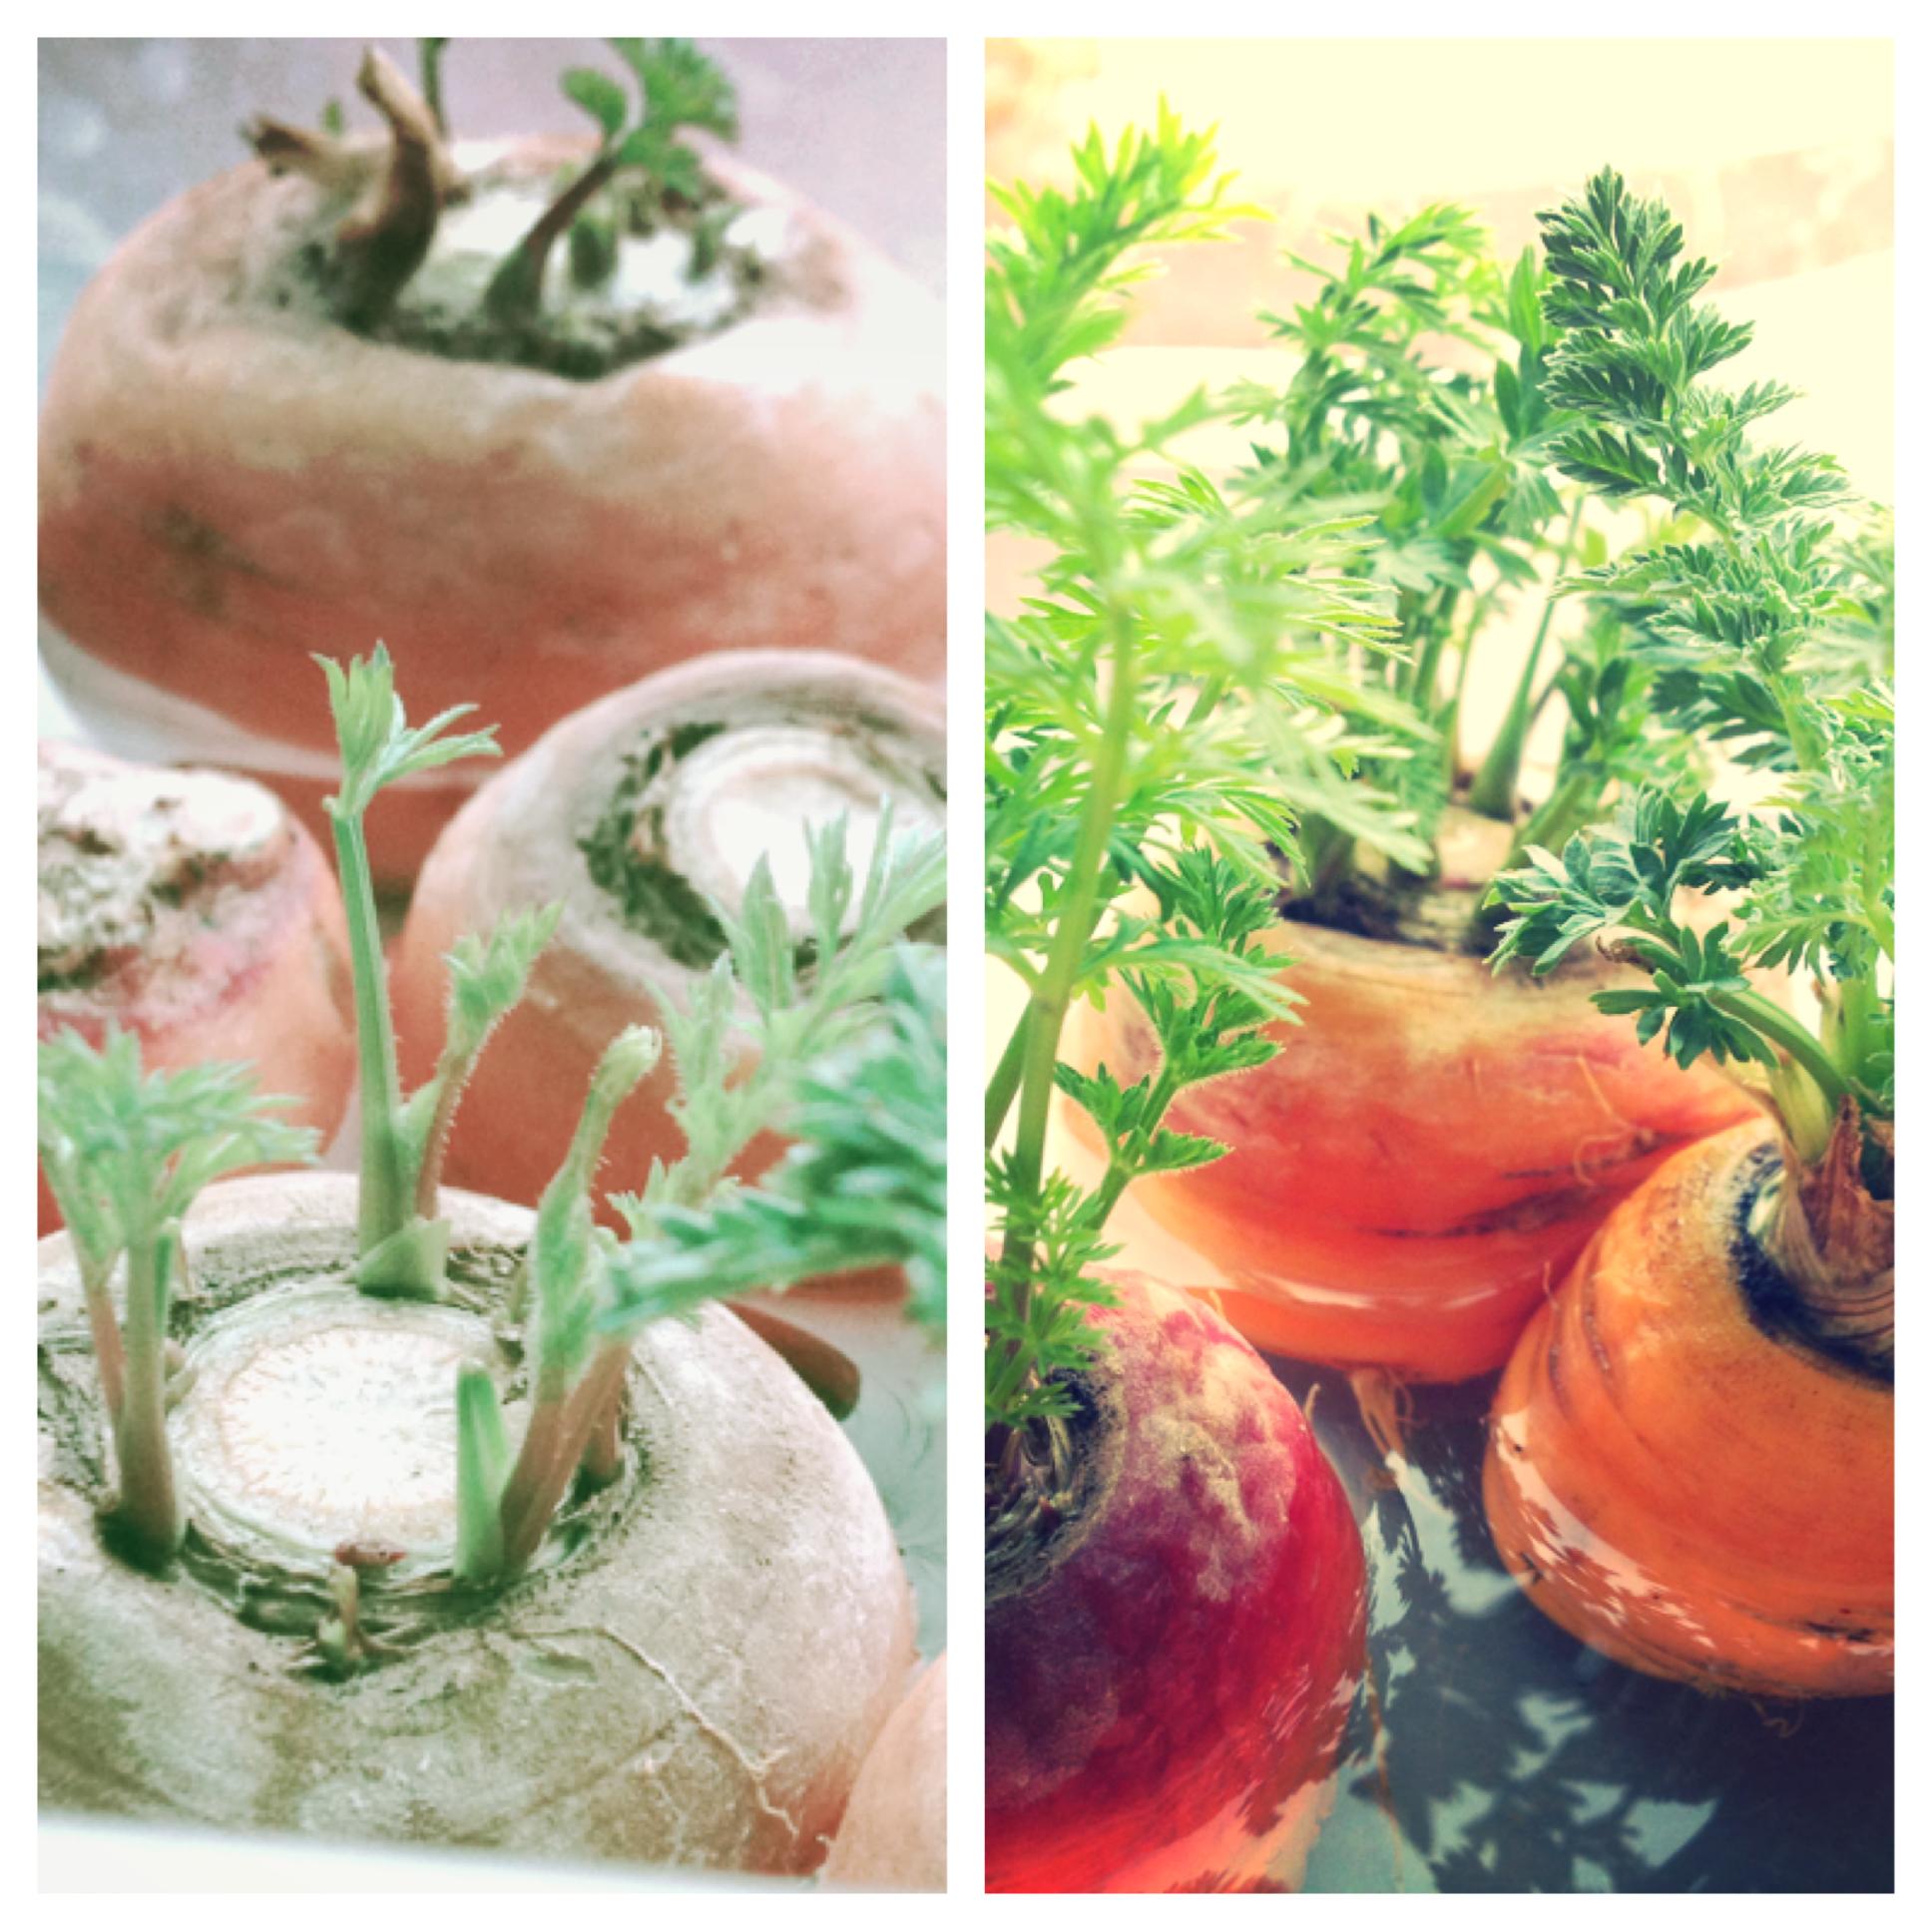 Carrot Top Growing Photo 1.jpg